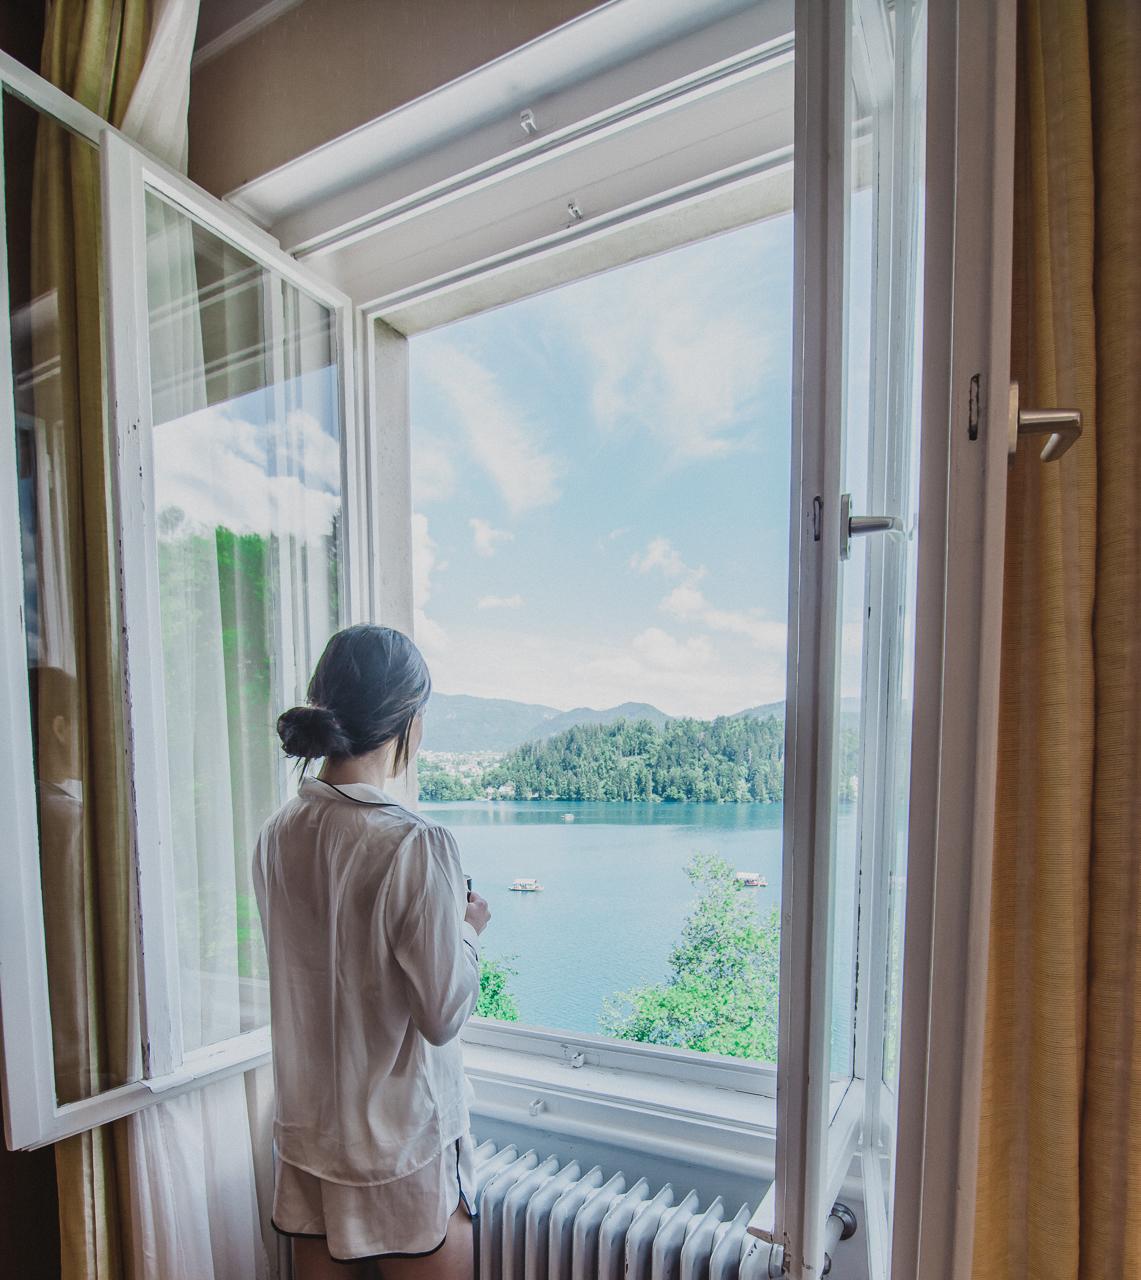 Vila Bled Luxury Boutique Hotel Slovenia Lake Bled (14 of 42)